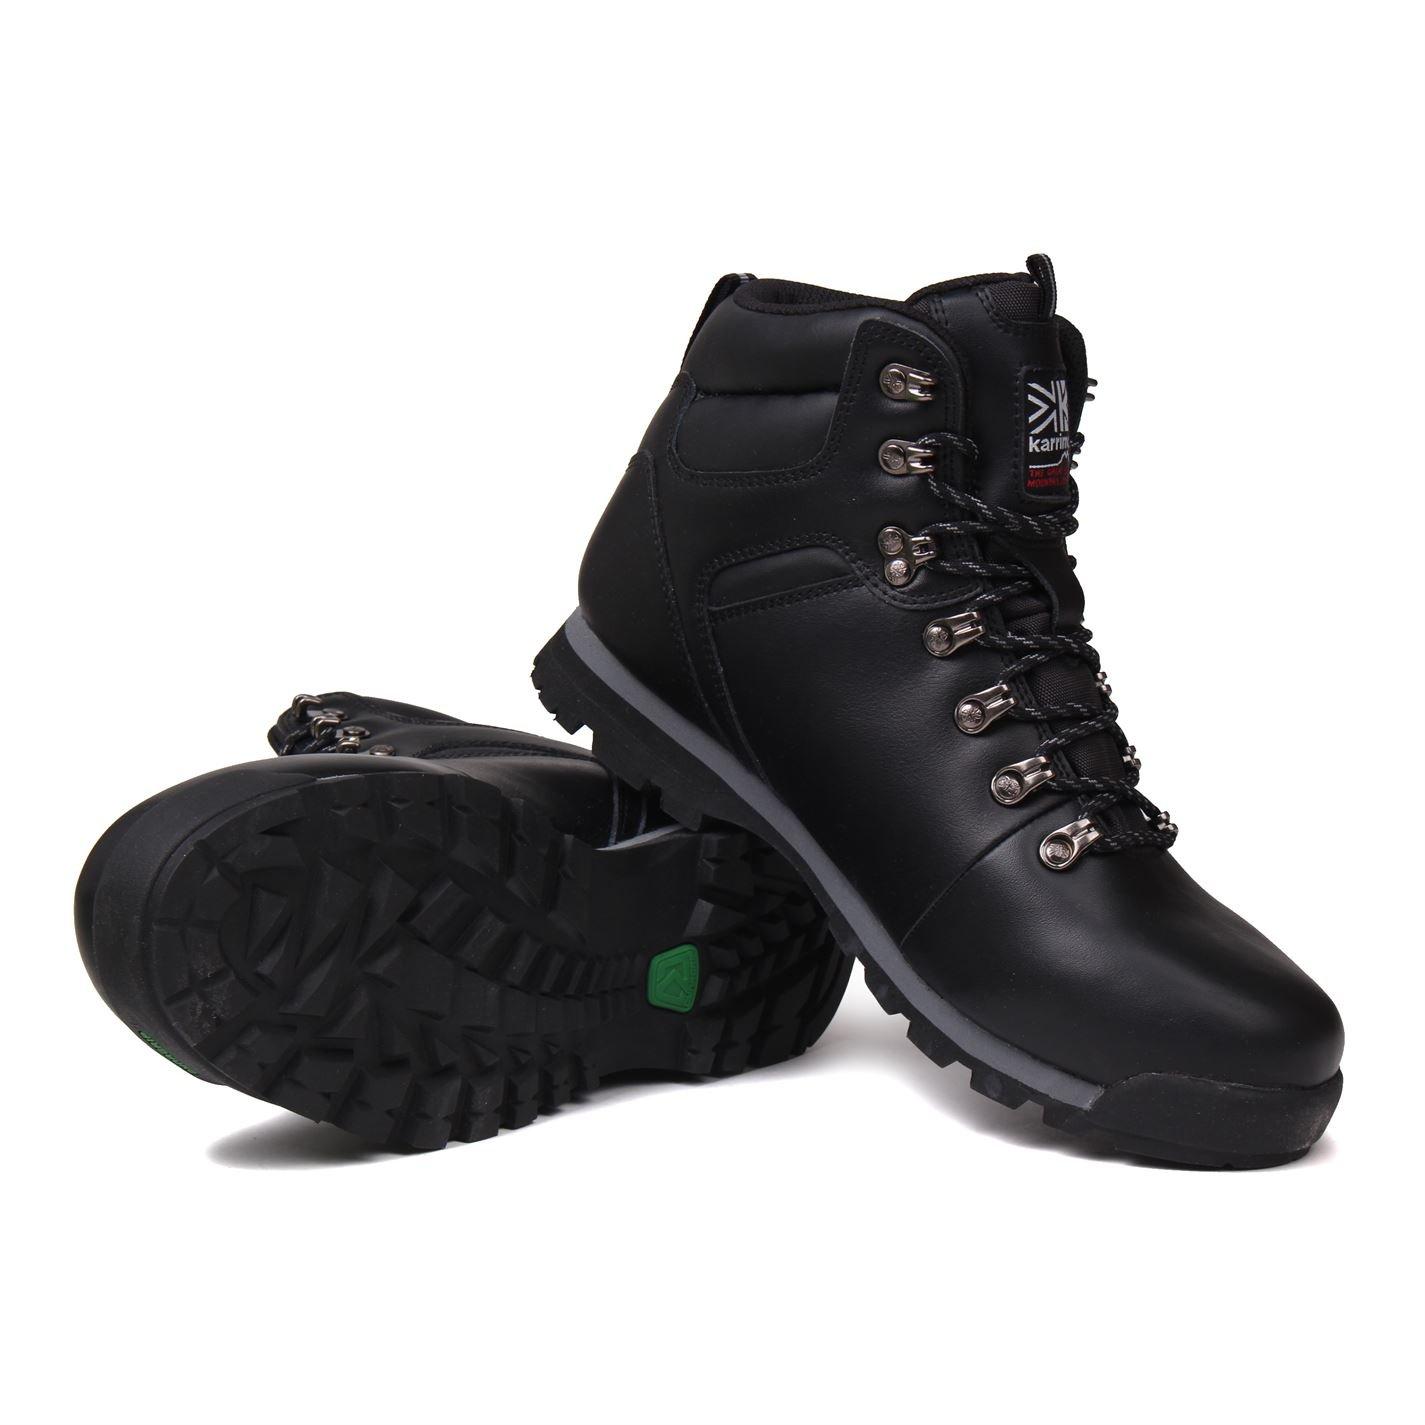 89e05bef472 Amazon.com | Karrimor Mens Munro Walking Hiking Boots Lace Up Shoes ...